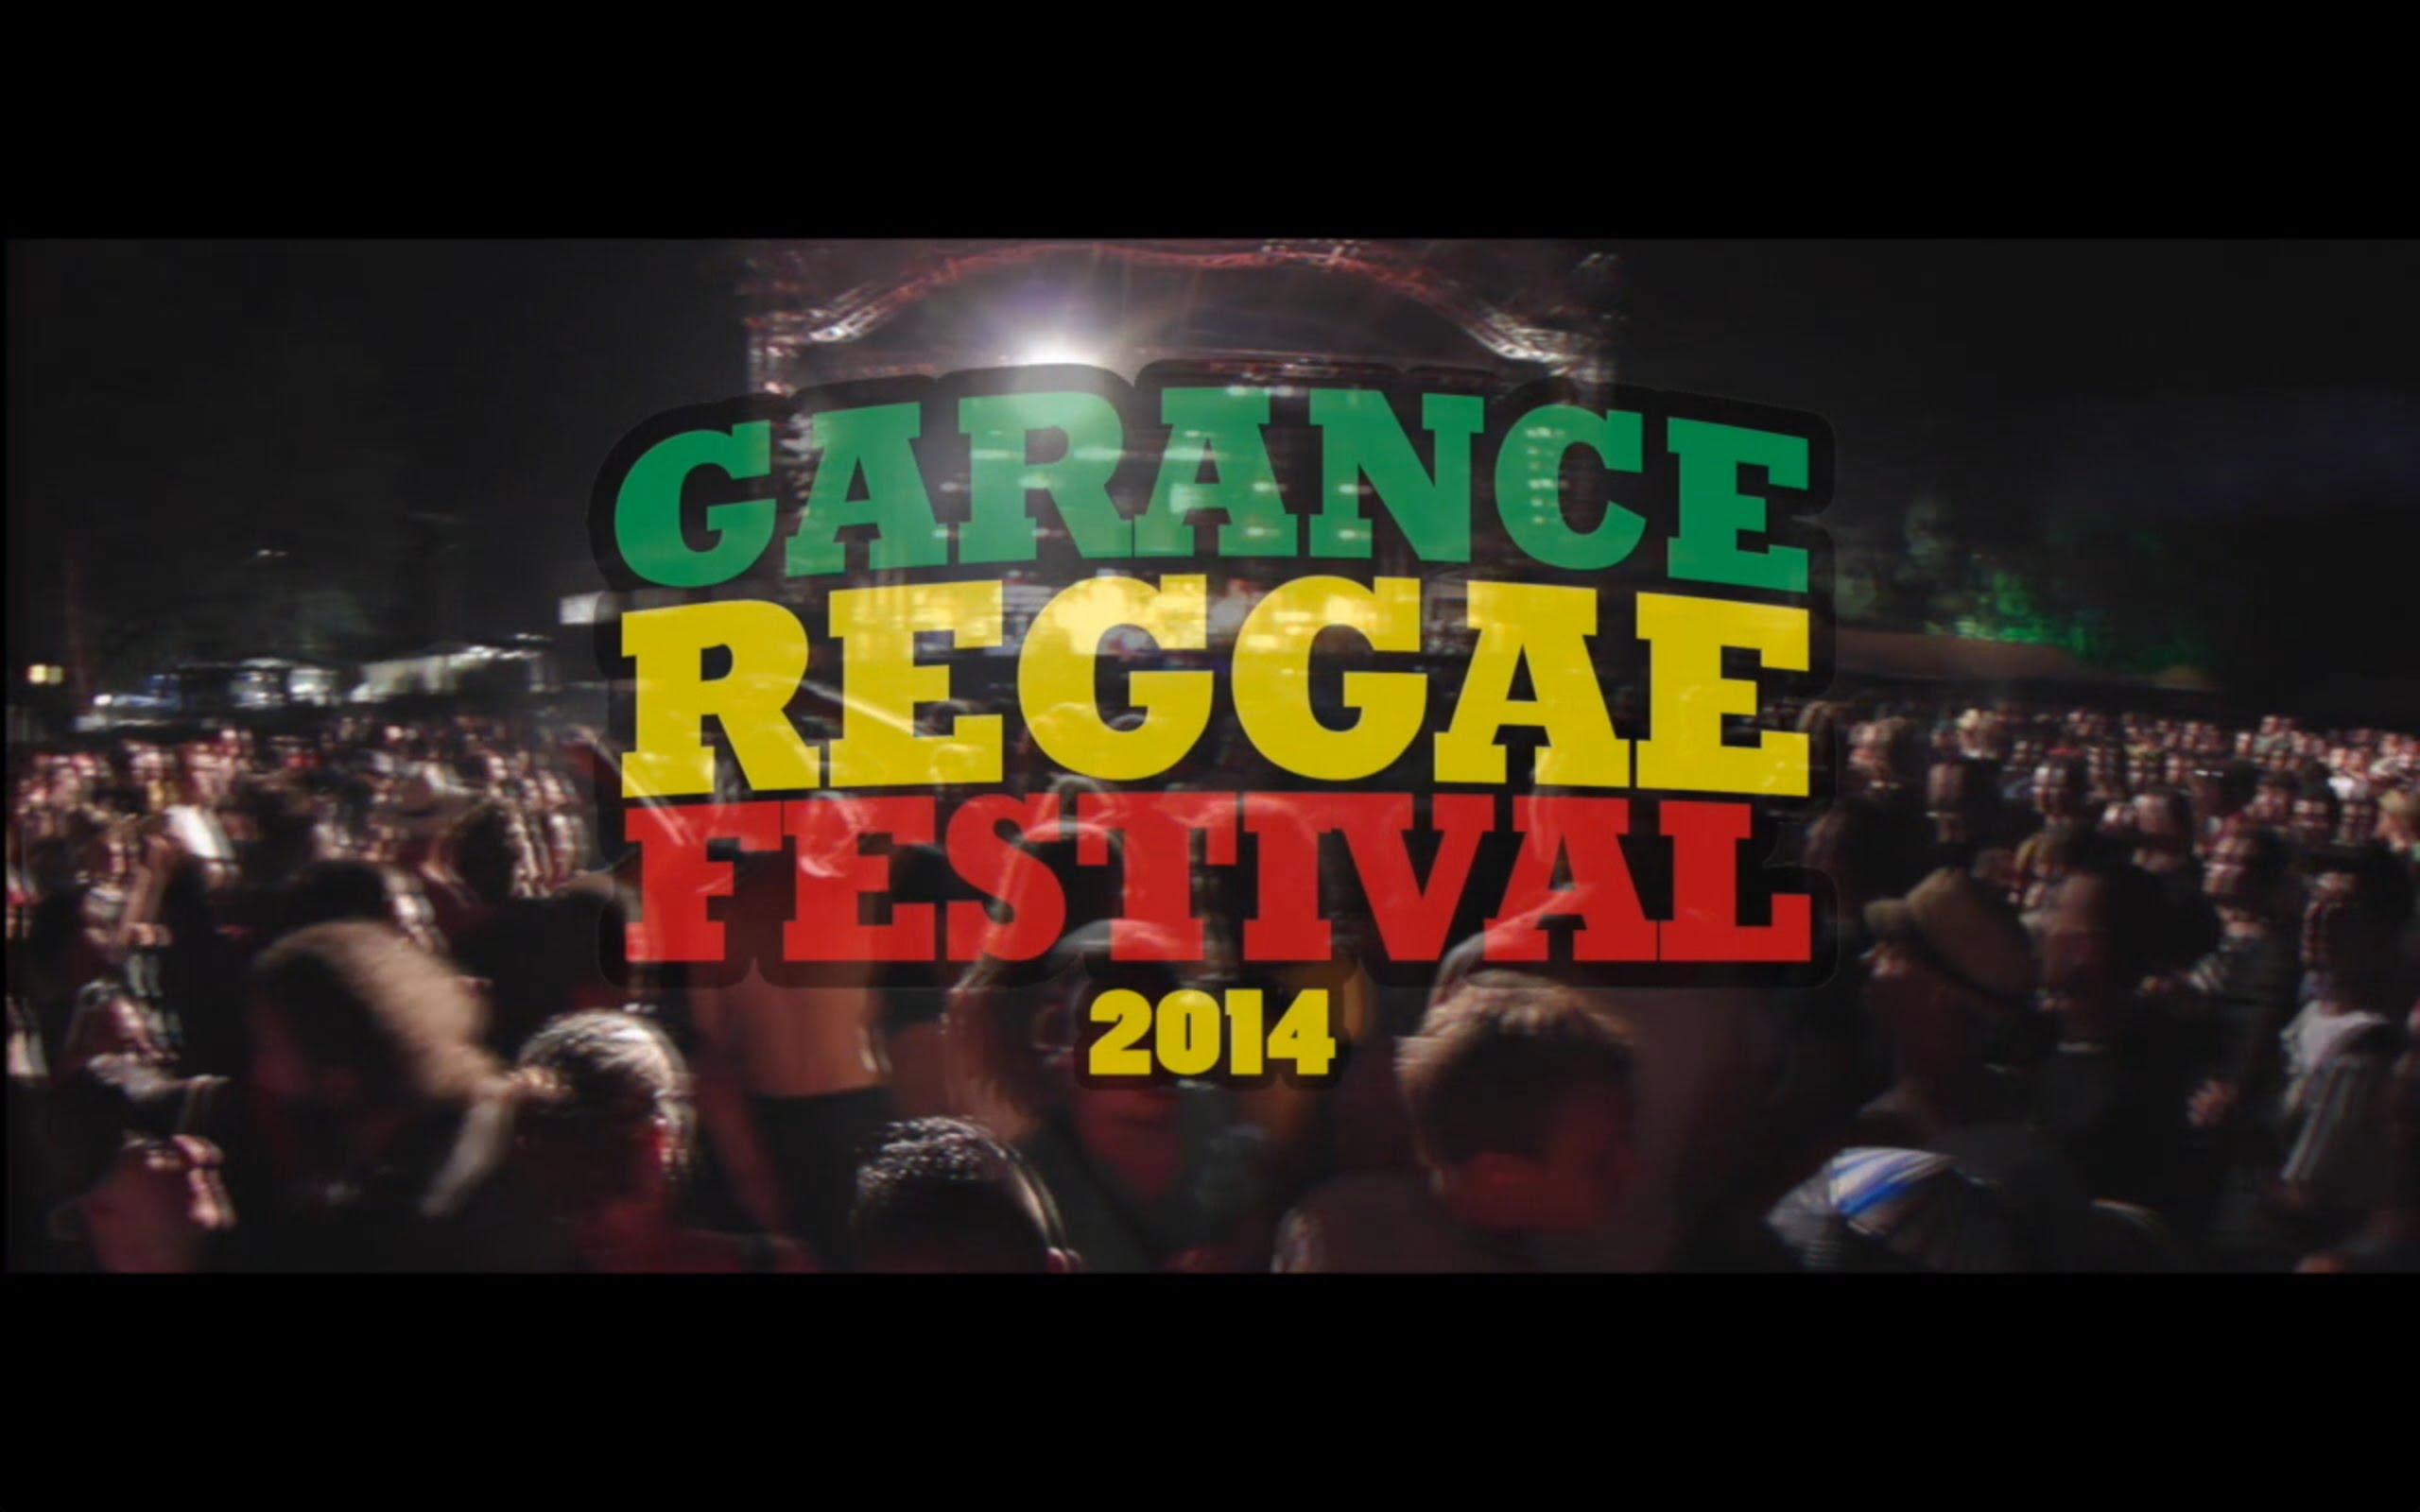 Garance Reggae Festival 2014 - Aftermovie [9/5/2014]